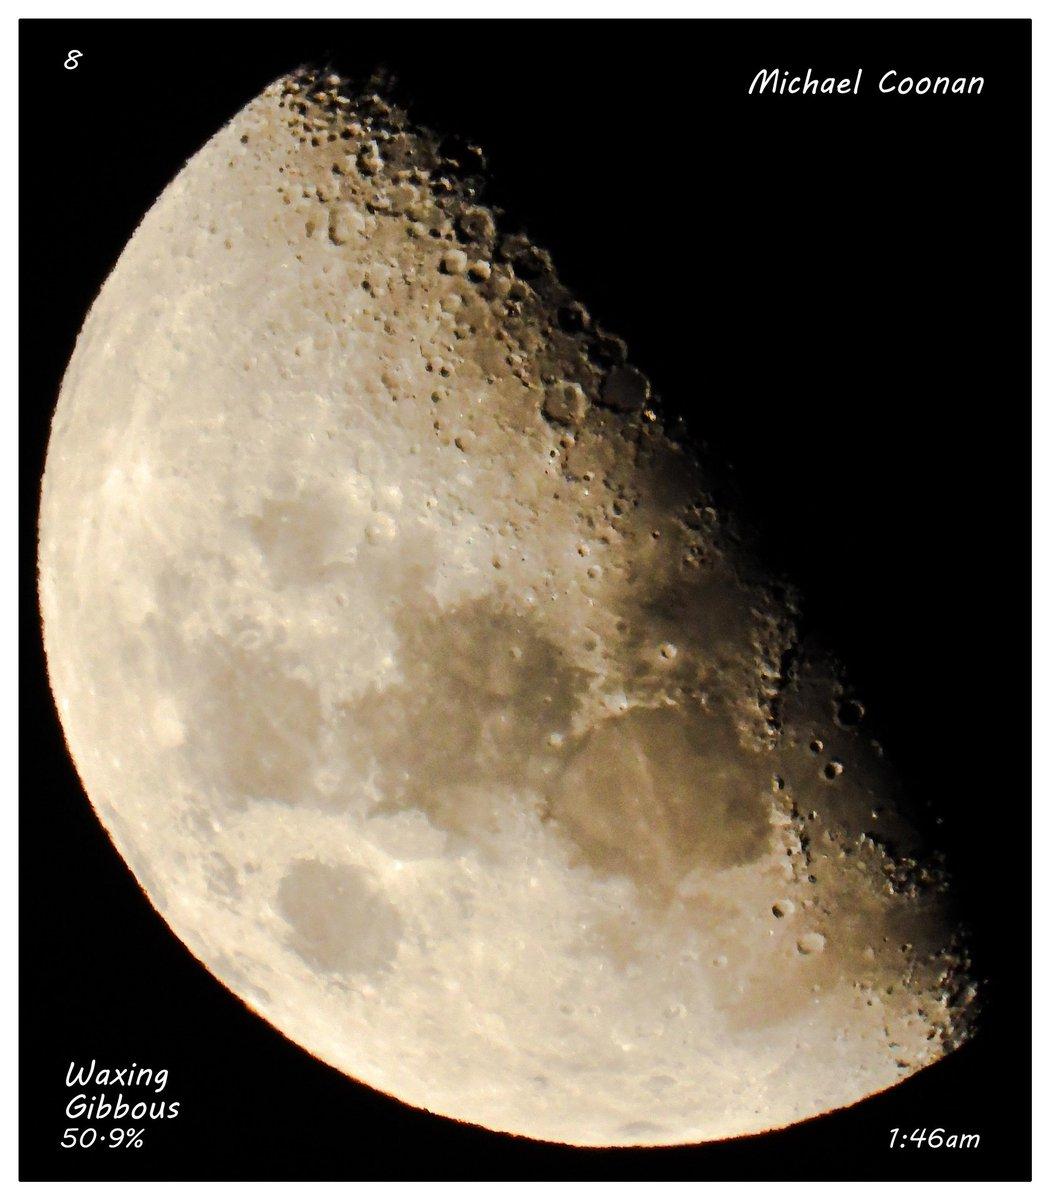 Sunday October 25th Waxing Gibbous Moon 60.9% in Wodonga Australia #StormHour #moon #luna #moonshot #Moon_awards #astrophotography #astronomy @CherScheff @KayMcCaffery1 @PicPublic @PicPoet #500pxrtg @ThePhotoHour @BonfirePictures @500pxrtg https://t.co/1g7ZuBAWvF